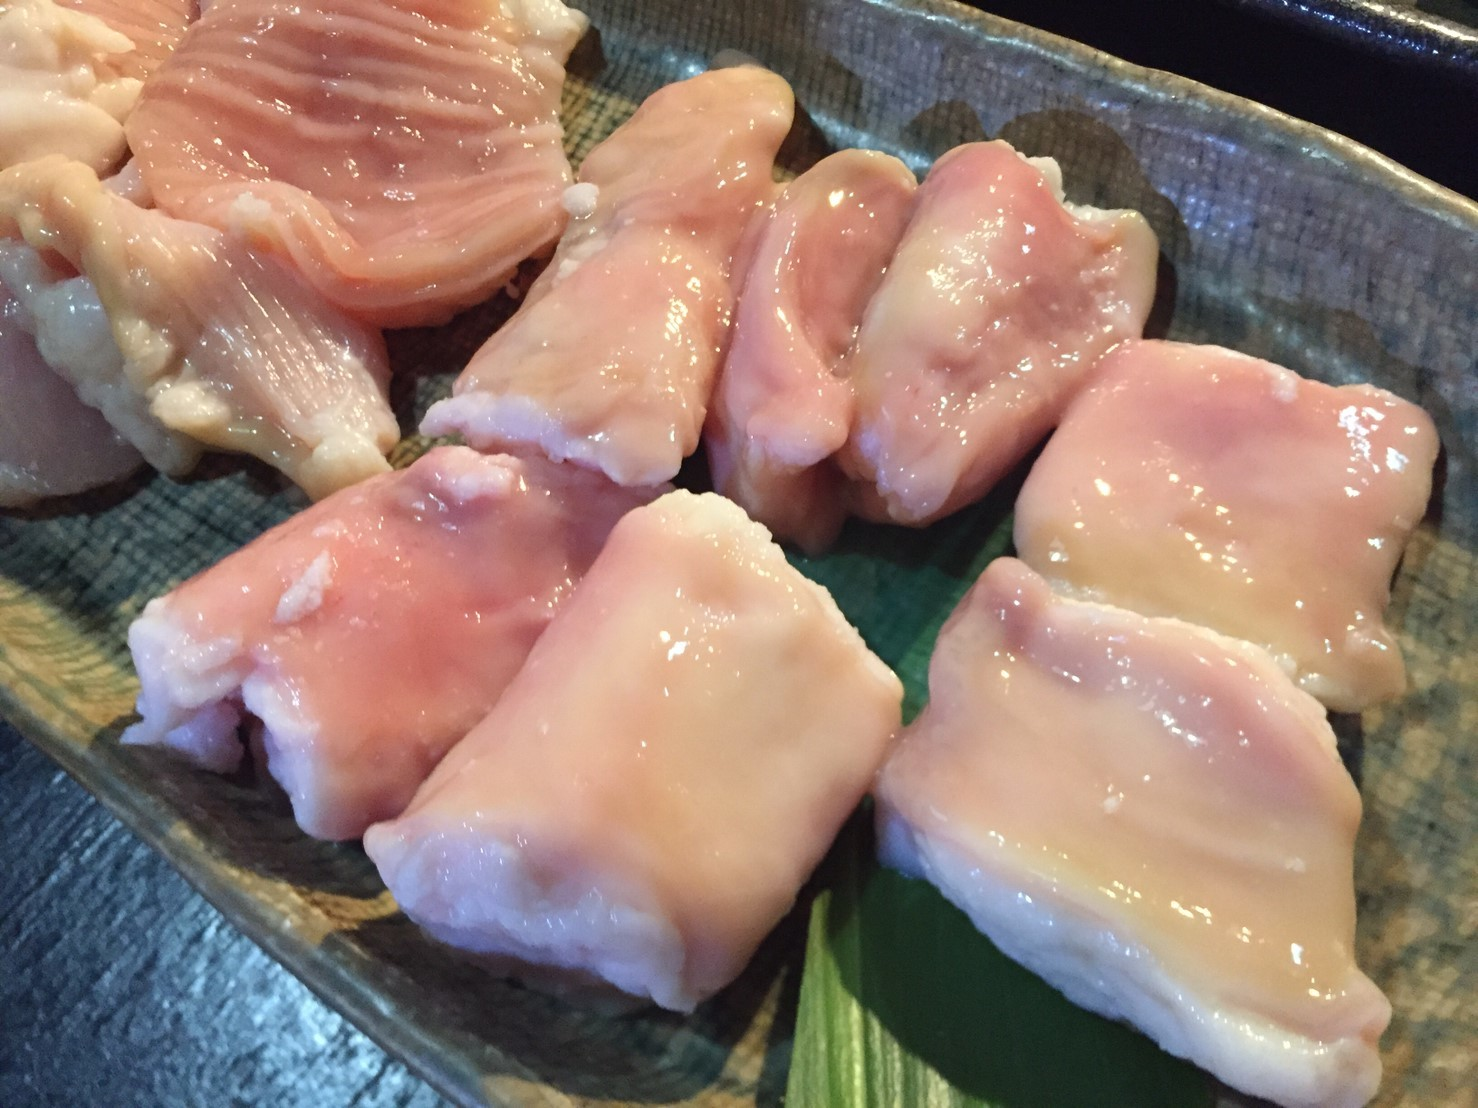 焼肉 鳥取牧場村 厚切りタン・山葵塩_e0115904_08053733.jpg